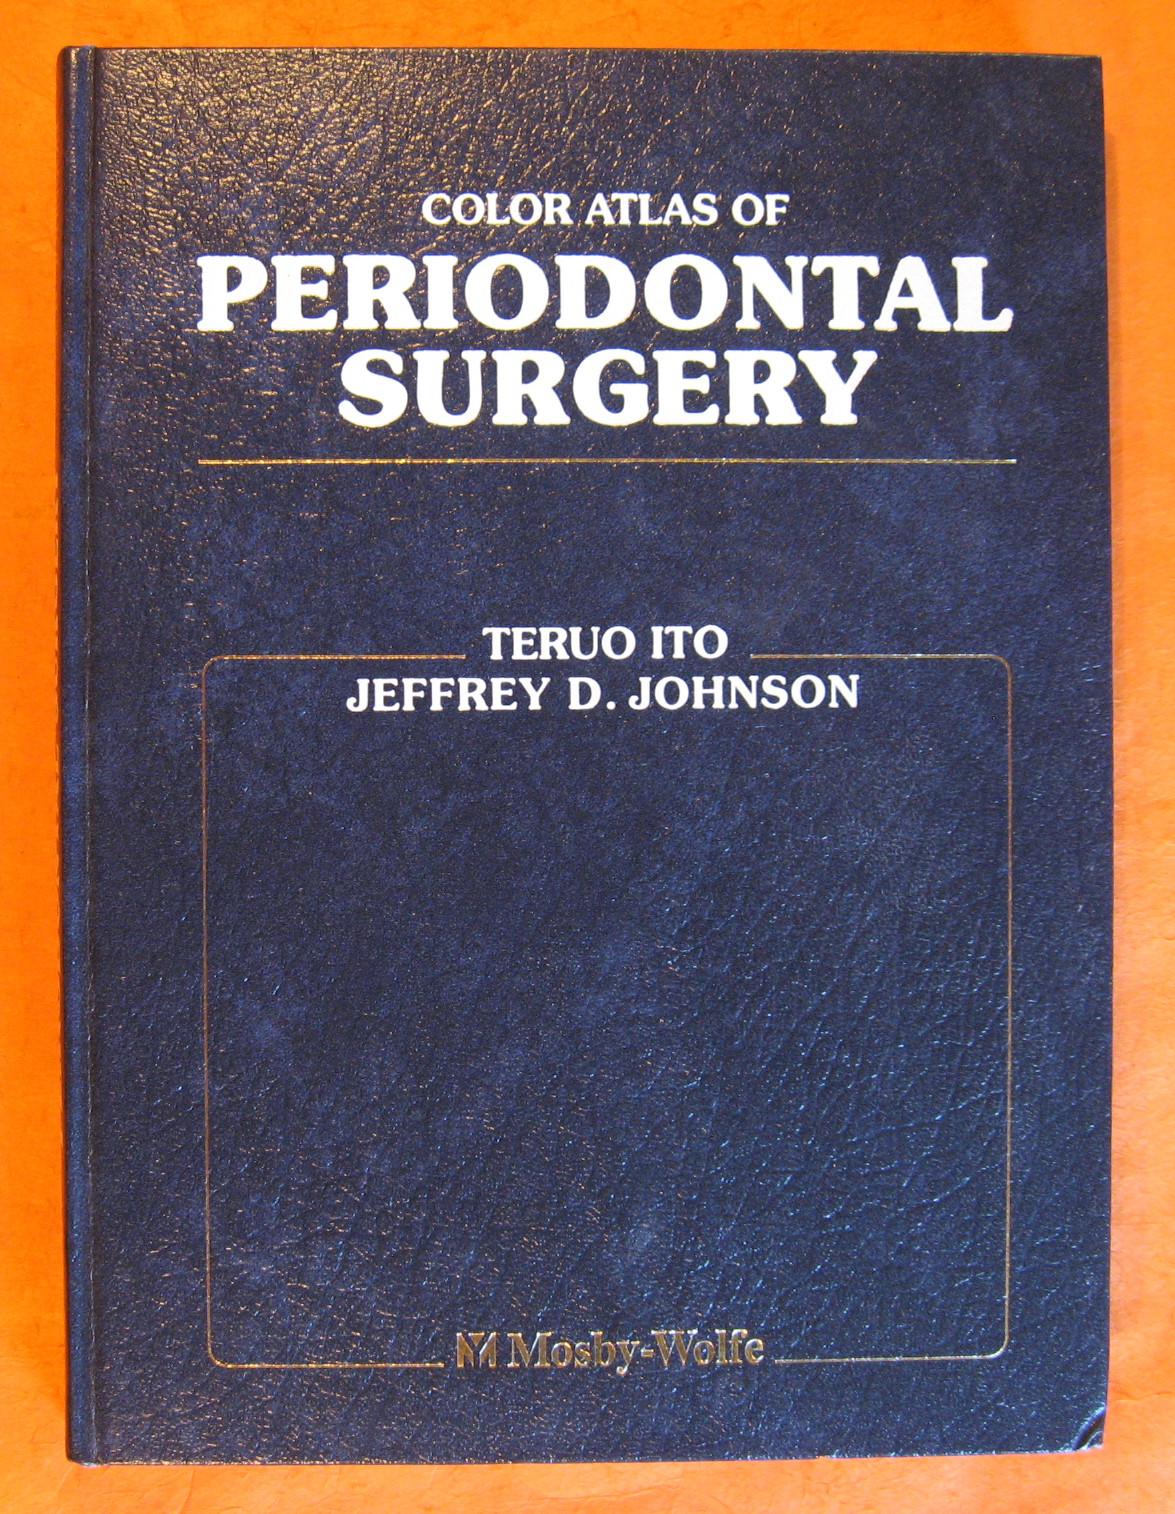 Color Atlas of Periodontal Surgery,, Ito, Teruo; Johnson, Jeffrey; Alpert, Brian, Binkley, Catherine, Schetx, James P.